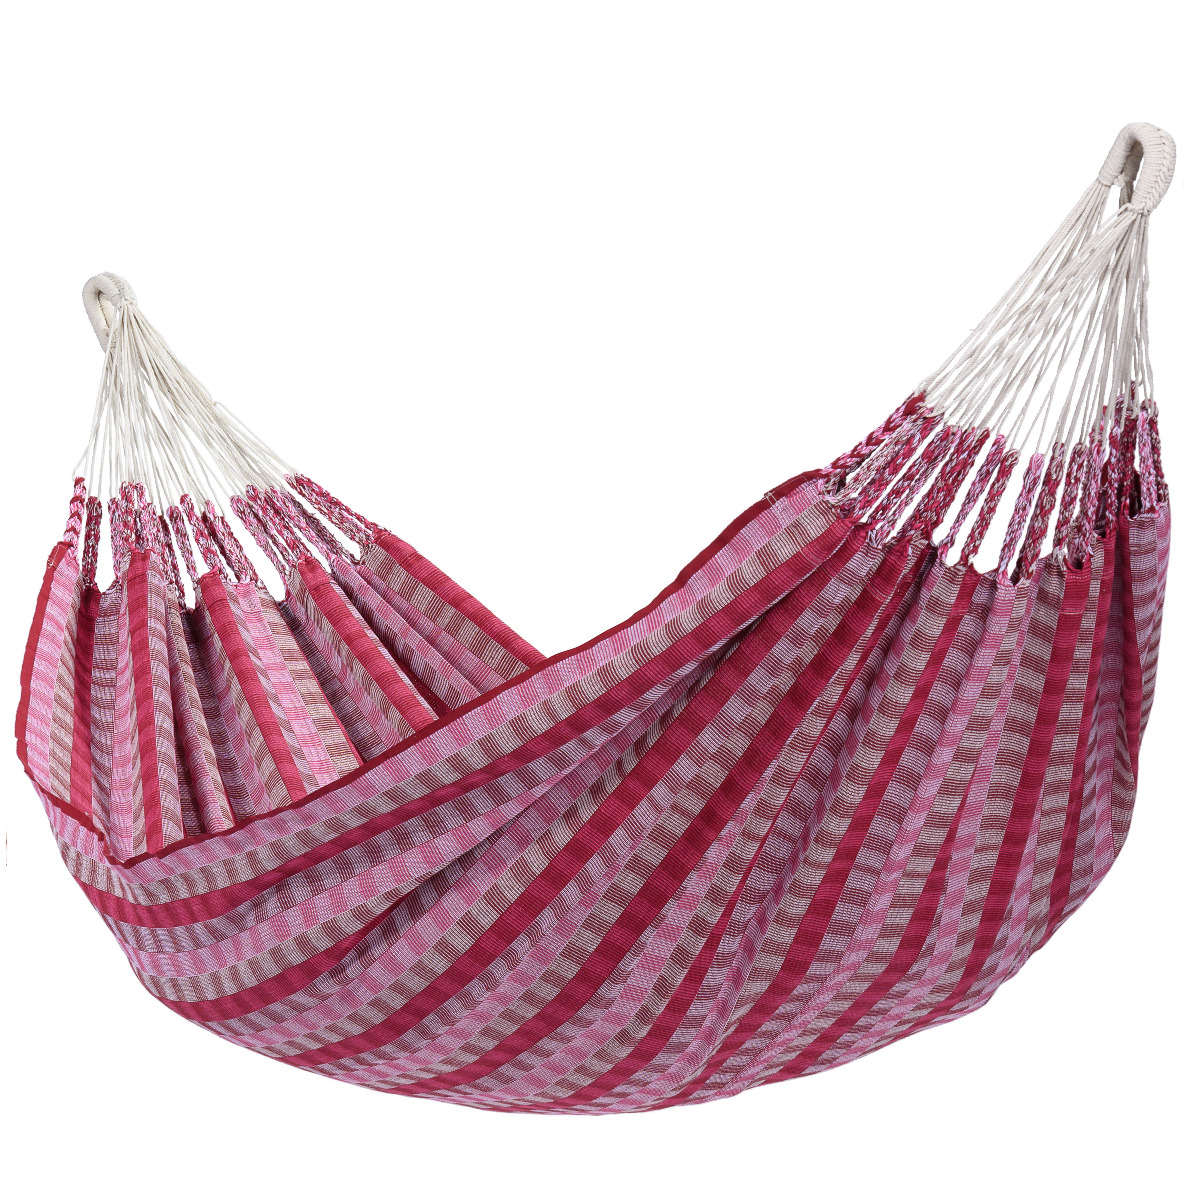 Hangmat 'Premium' Cherry - Tropilex �